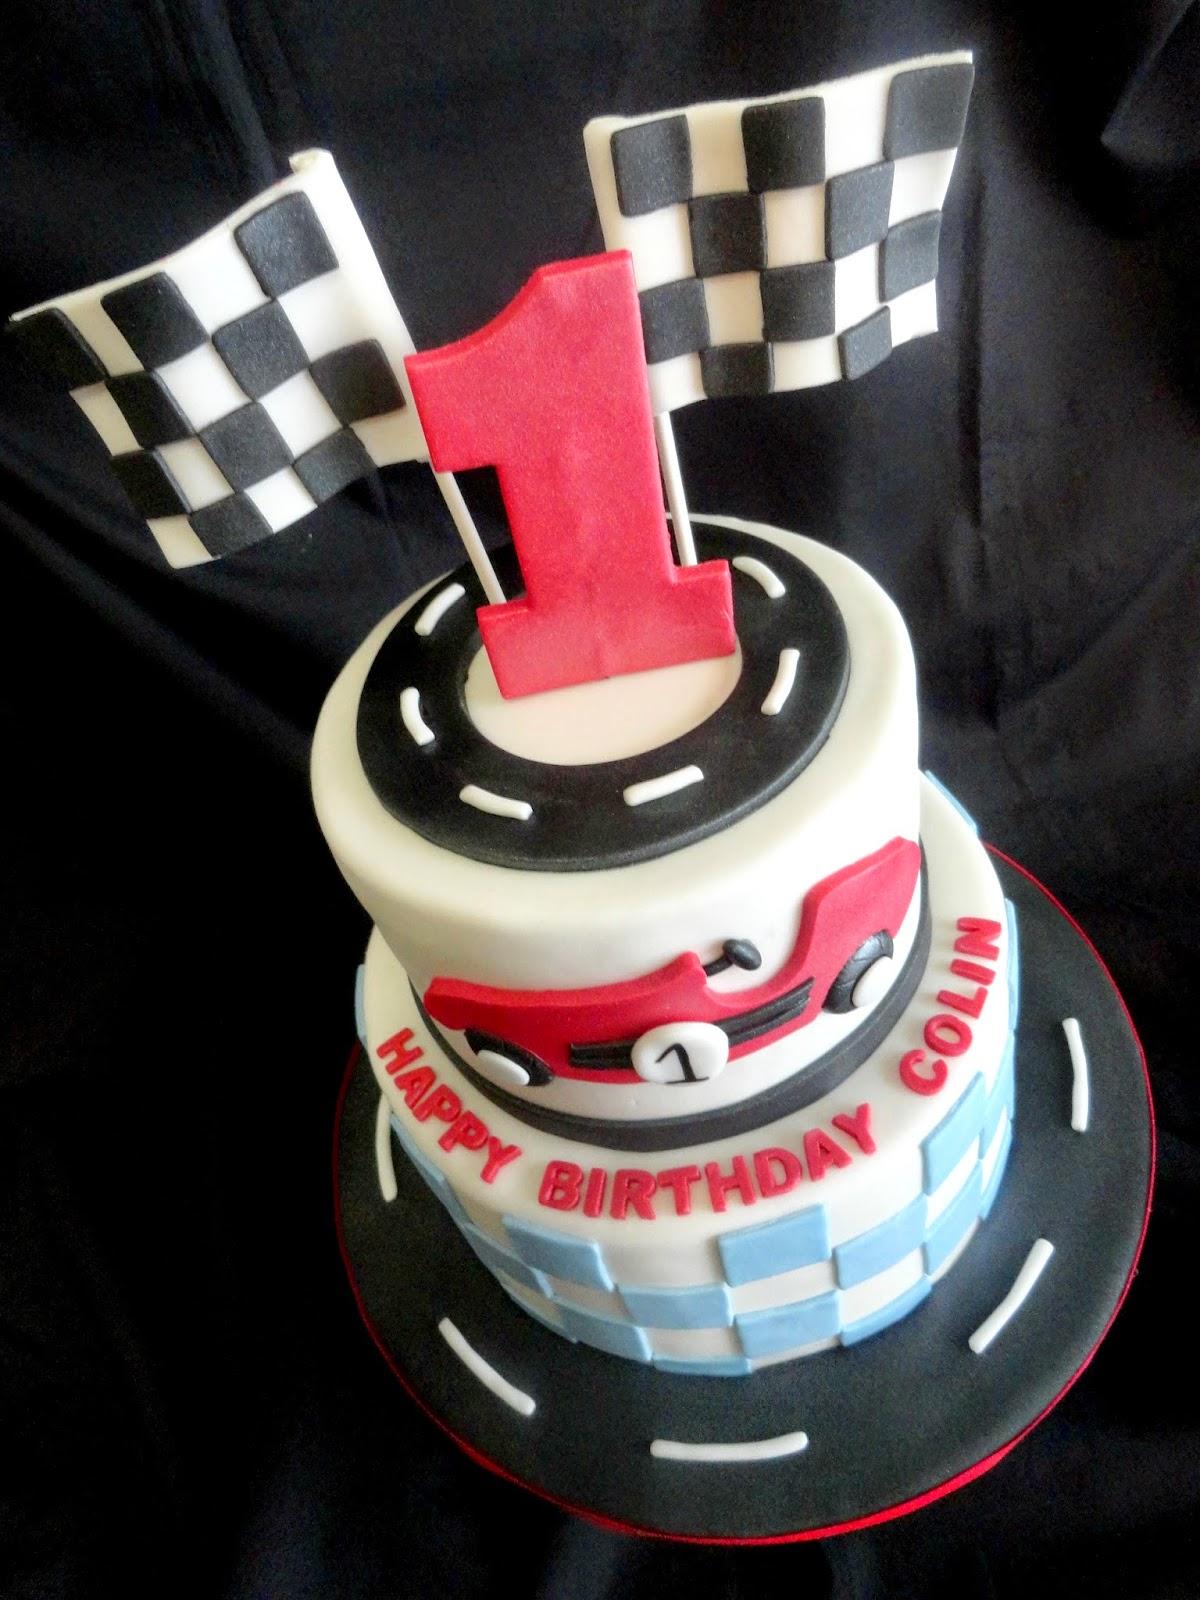 Pink Little Cake Race Car Theme 1st Birthday Cake